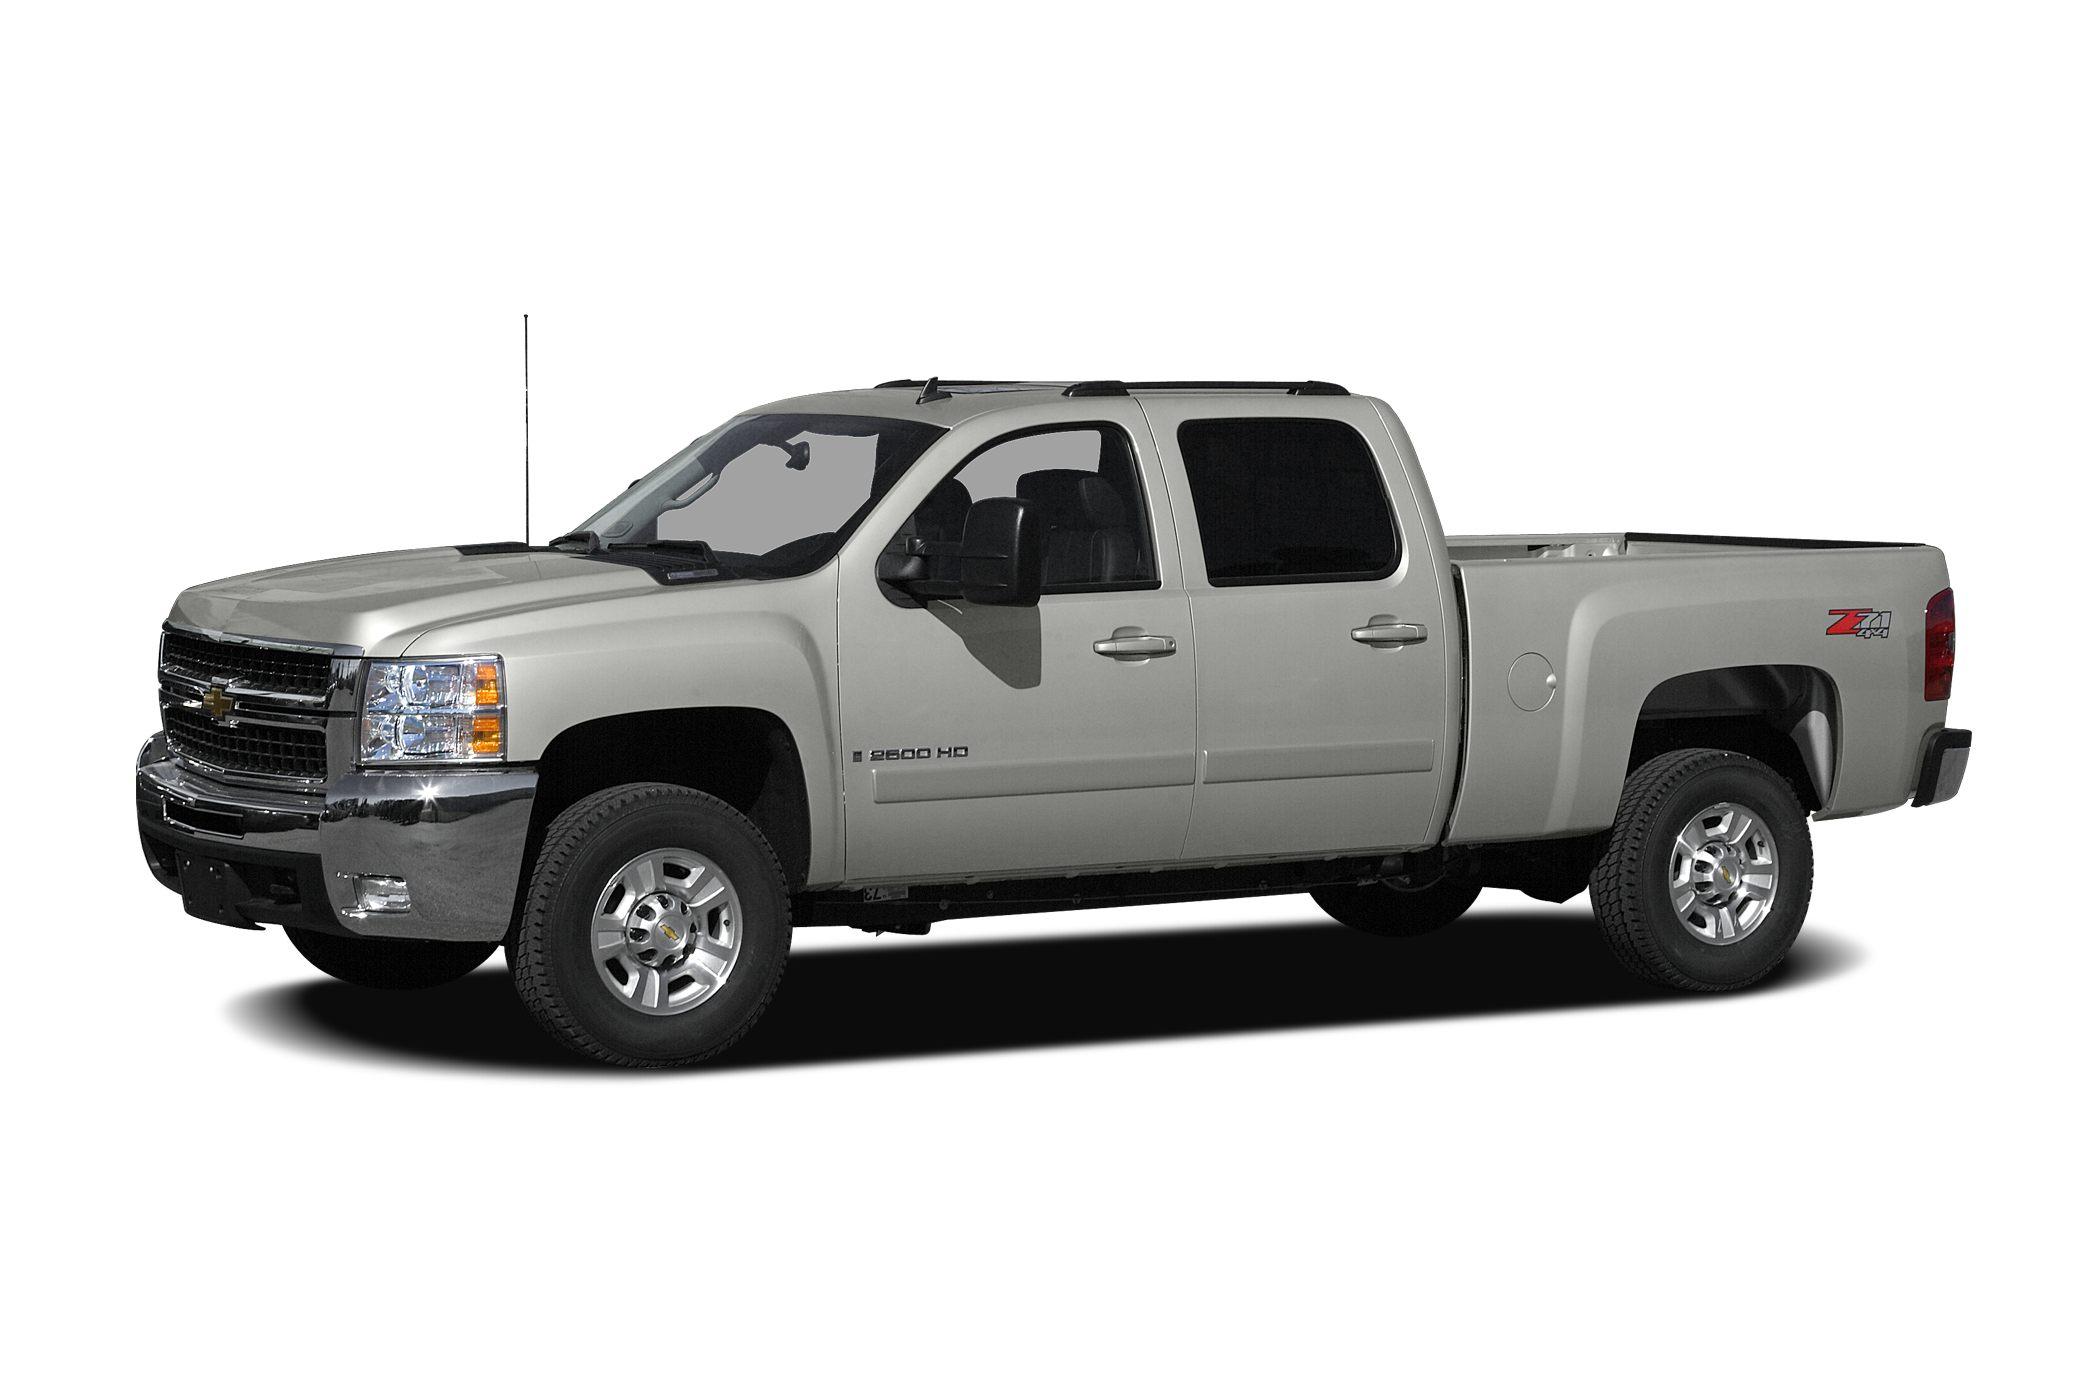 2008 Chevrolet Silverado 2500HD  Miles 63972Color Red Stock 16198 VIN 1GCHK23K68F189820